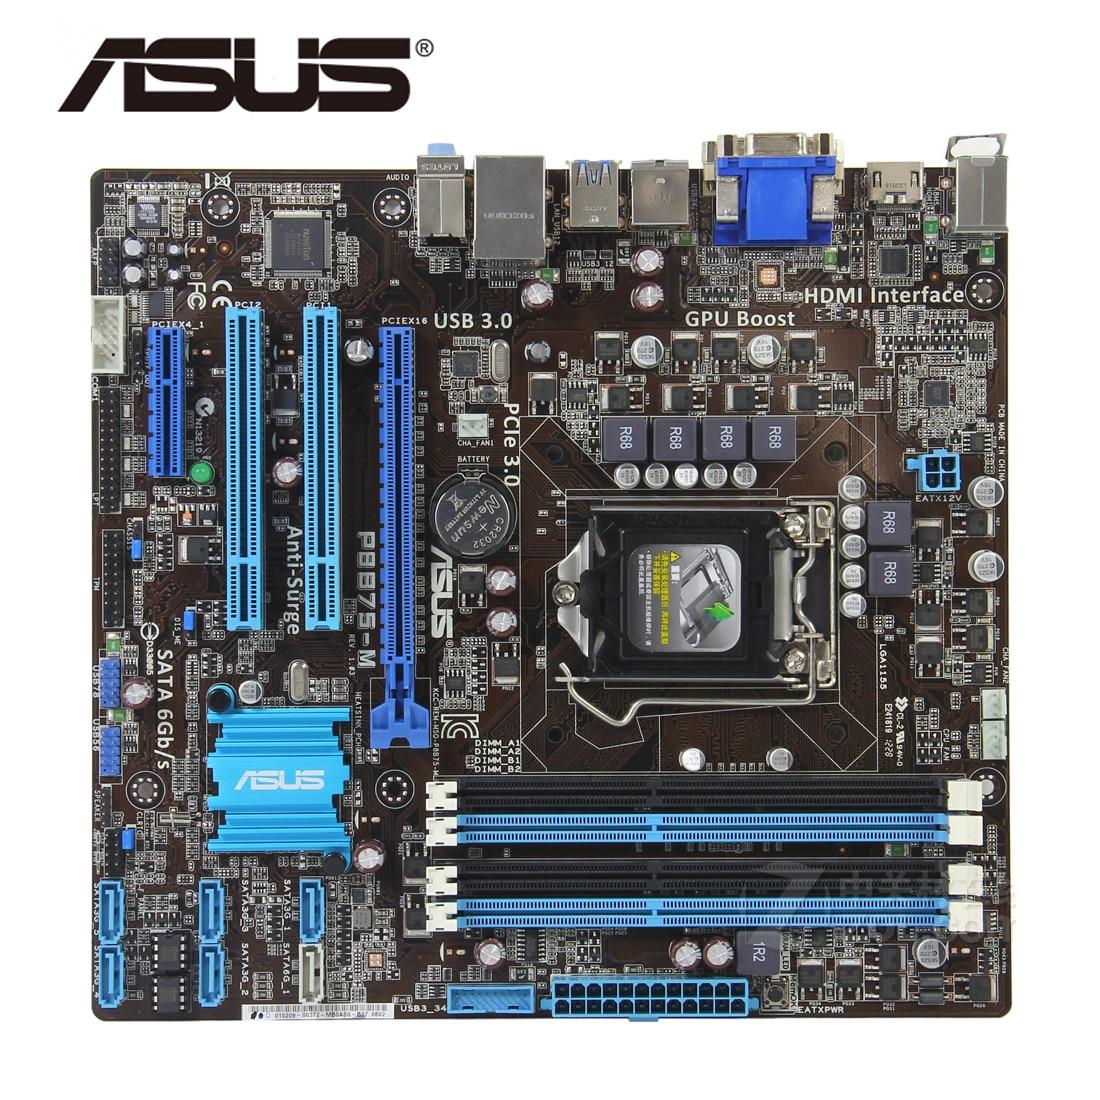 BX80637i53350P Intel Core-i5 3350P Quad-Core Processor 3.1 Ghz 6 MB Cache LGA 1155 Renewed